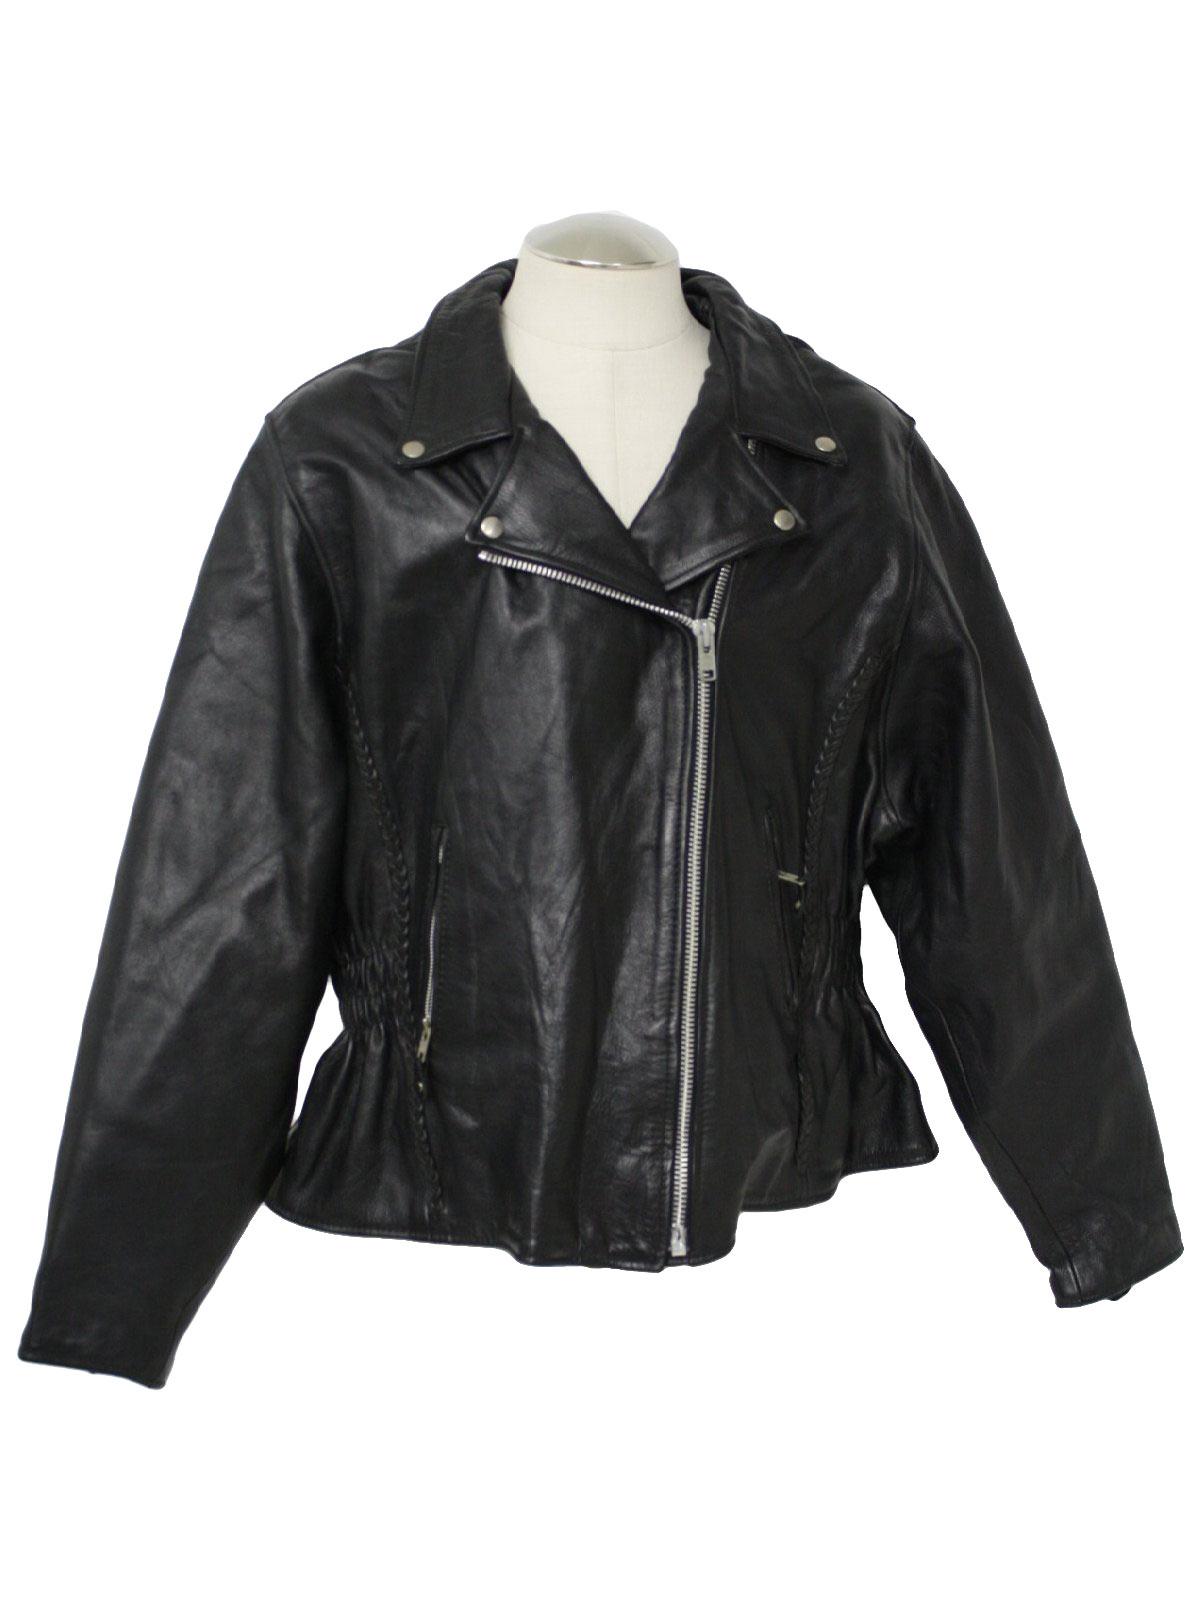 1980s Retro Leather Jacket 80s No Label Womens Black